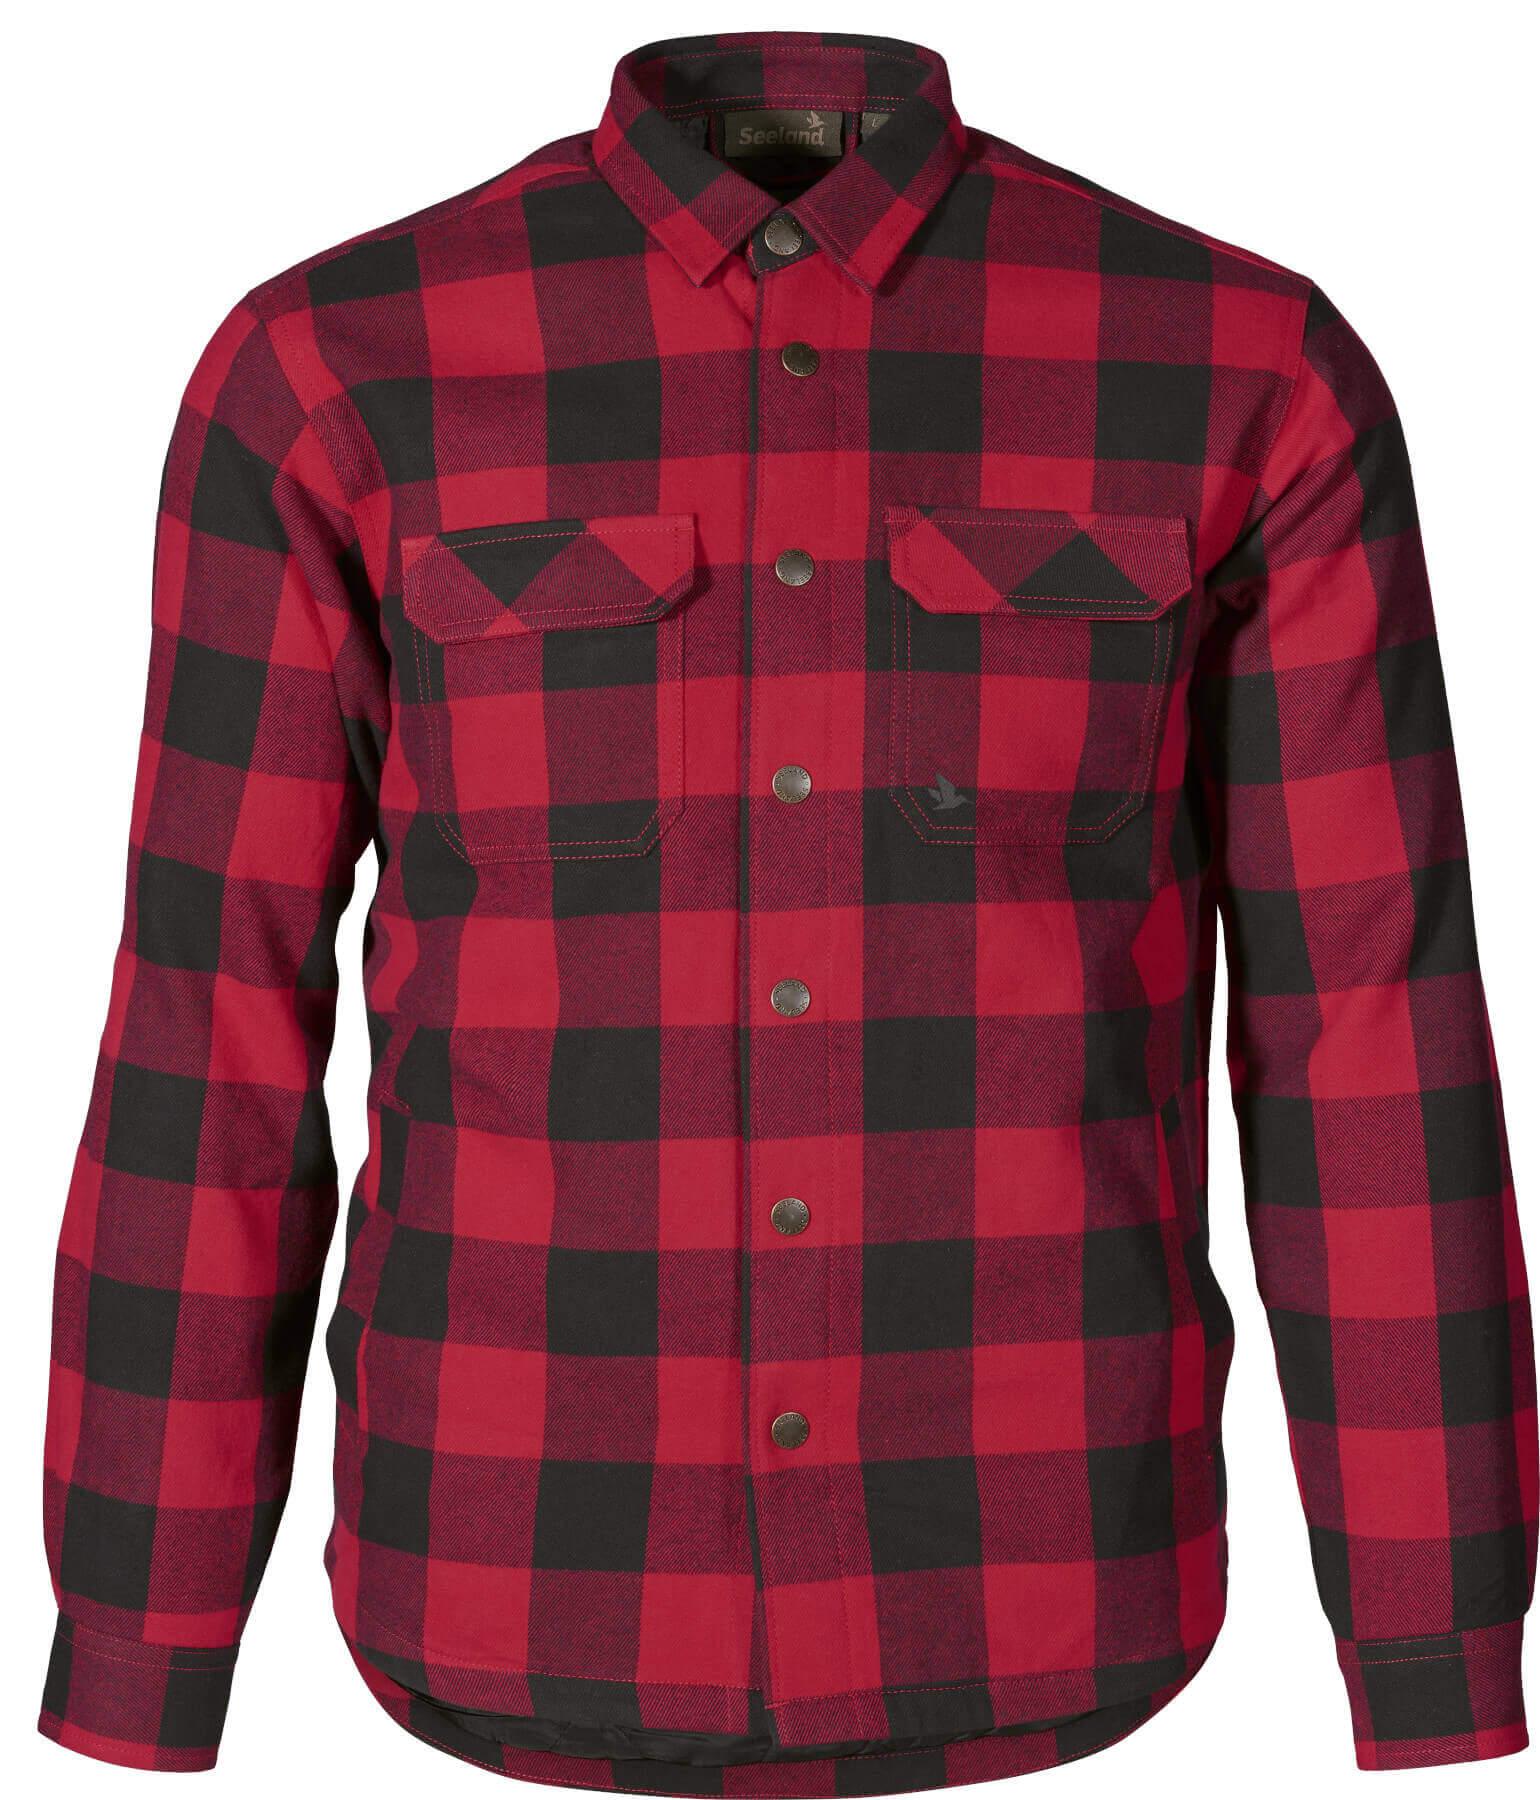 Rotkariertes Flanellhemd in Holzfälleroptik